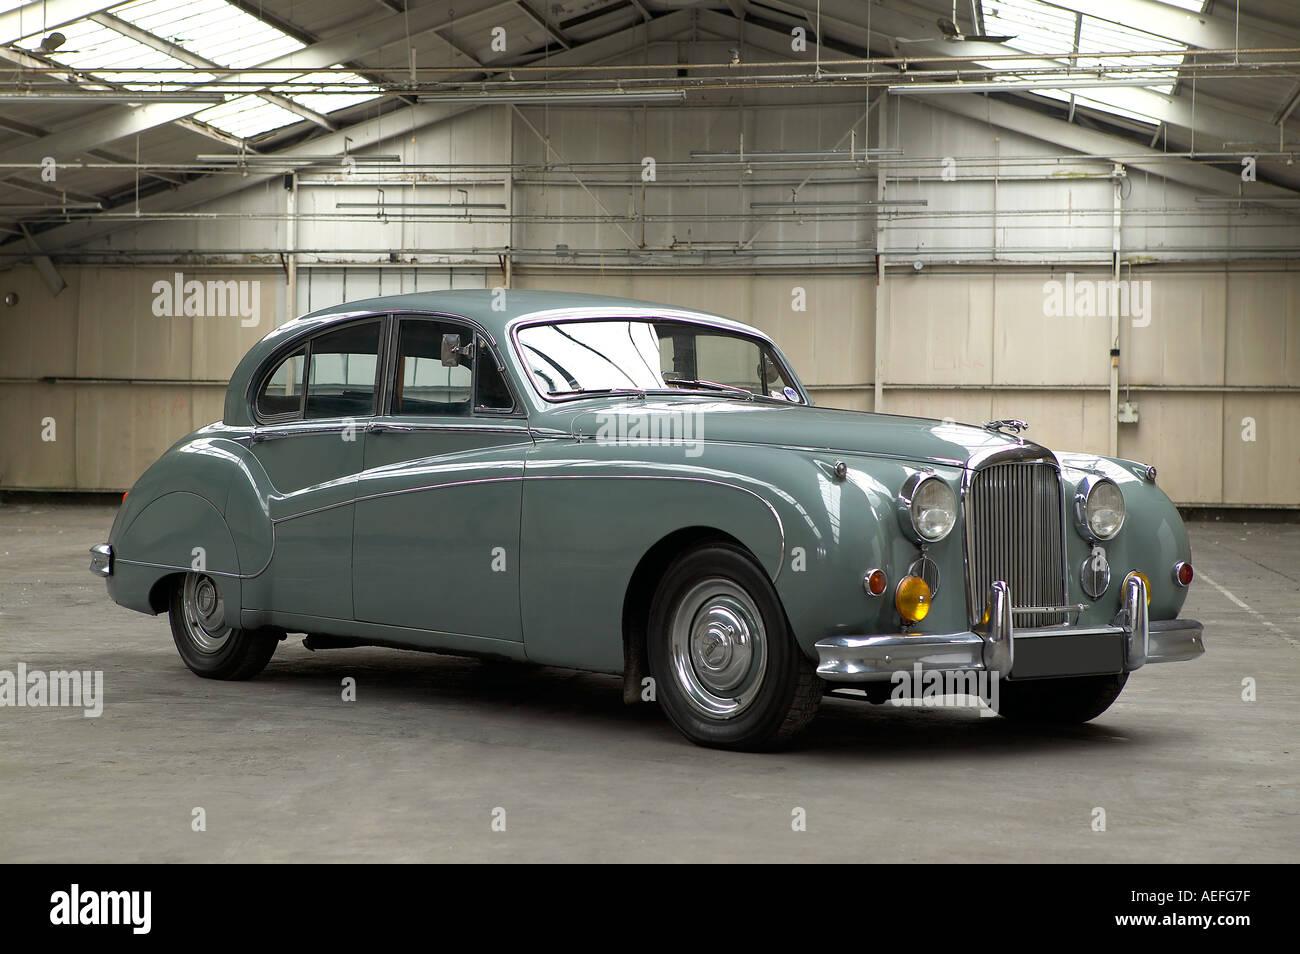 1961 Jaguar Mk IX 4 door saloon 3 8 litre 6 cylinder inline engine Country of origin United Kingdom Stock Photo